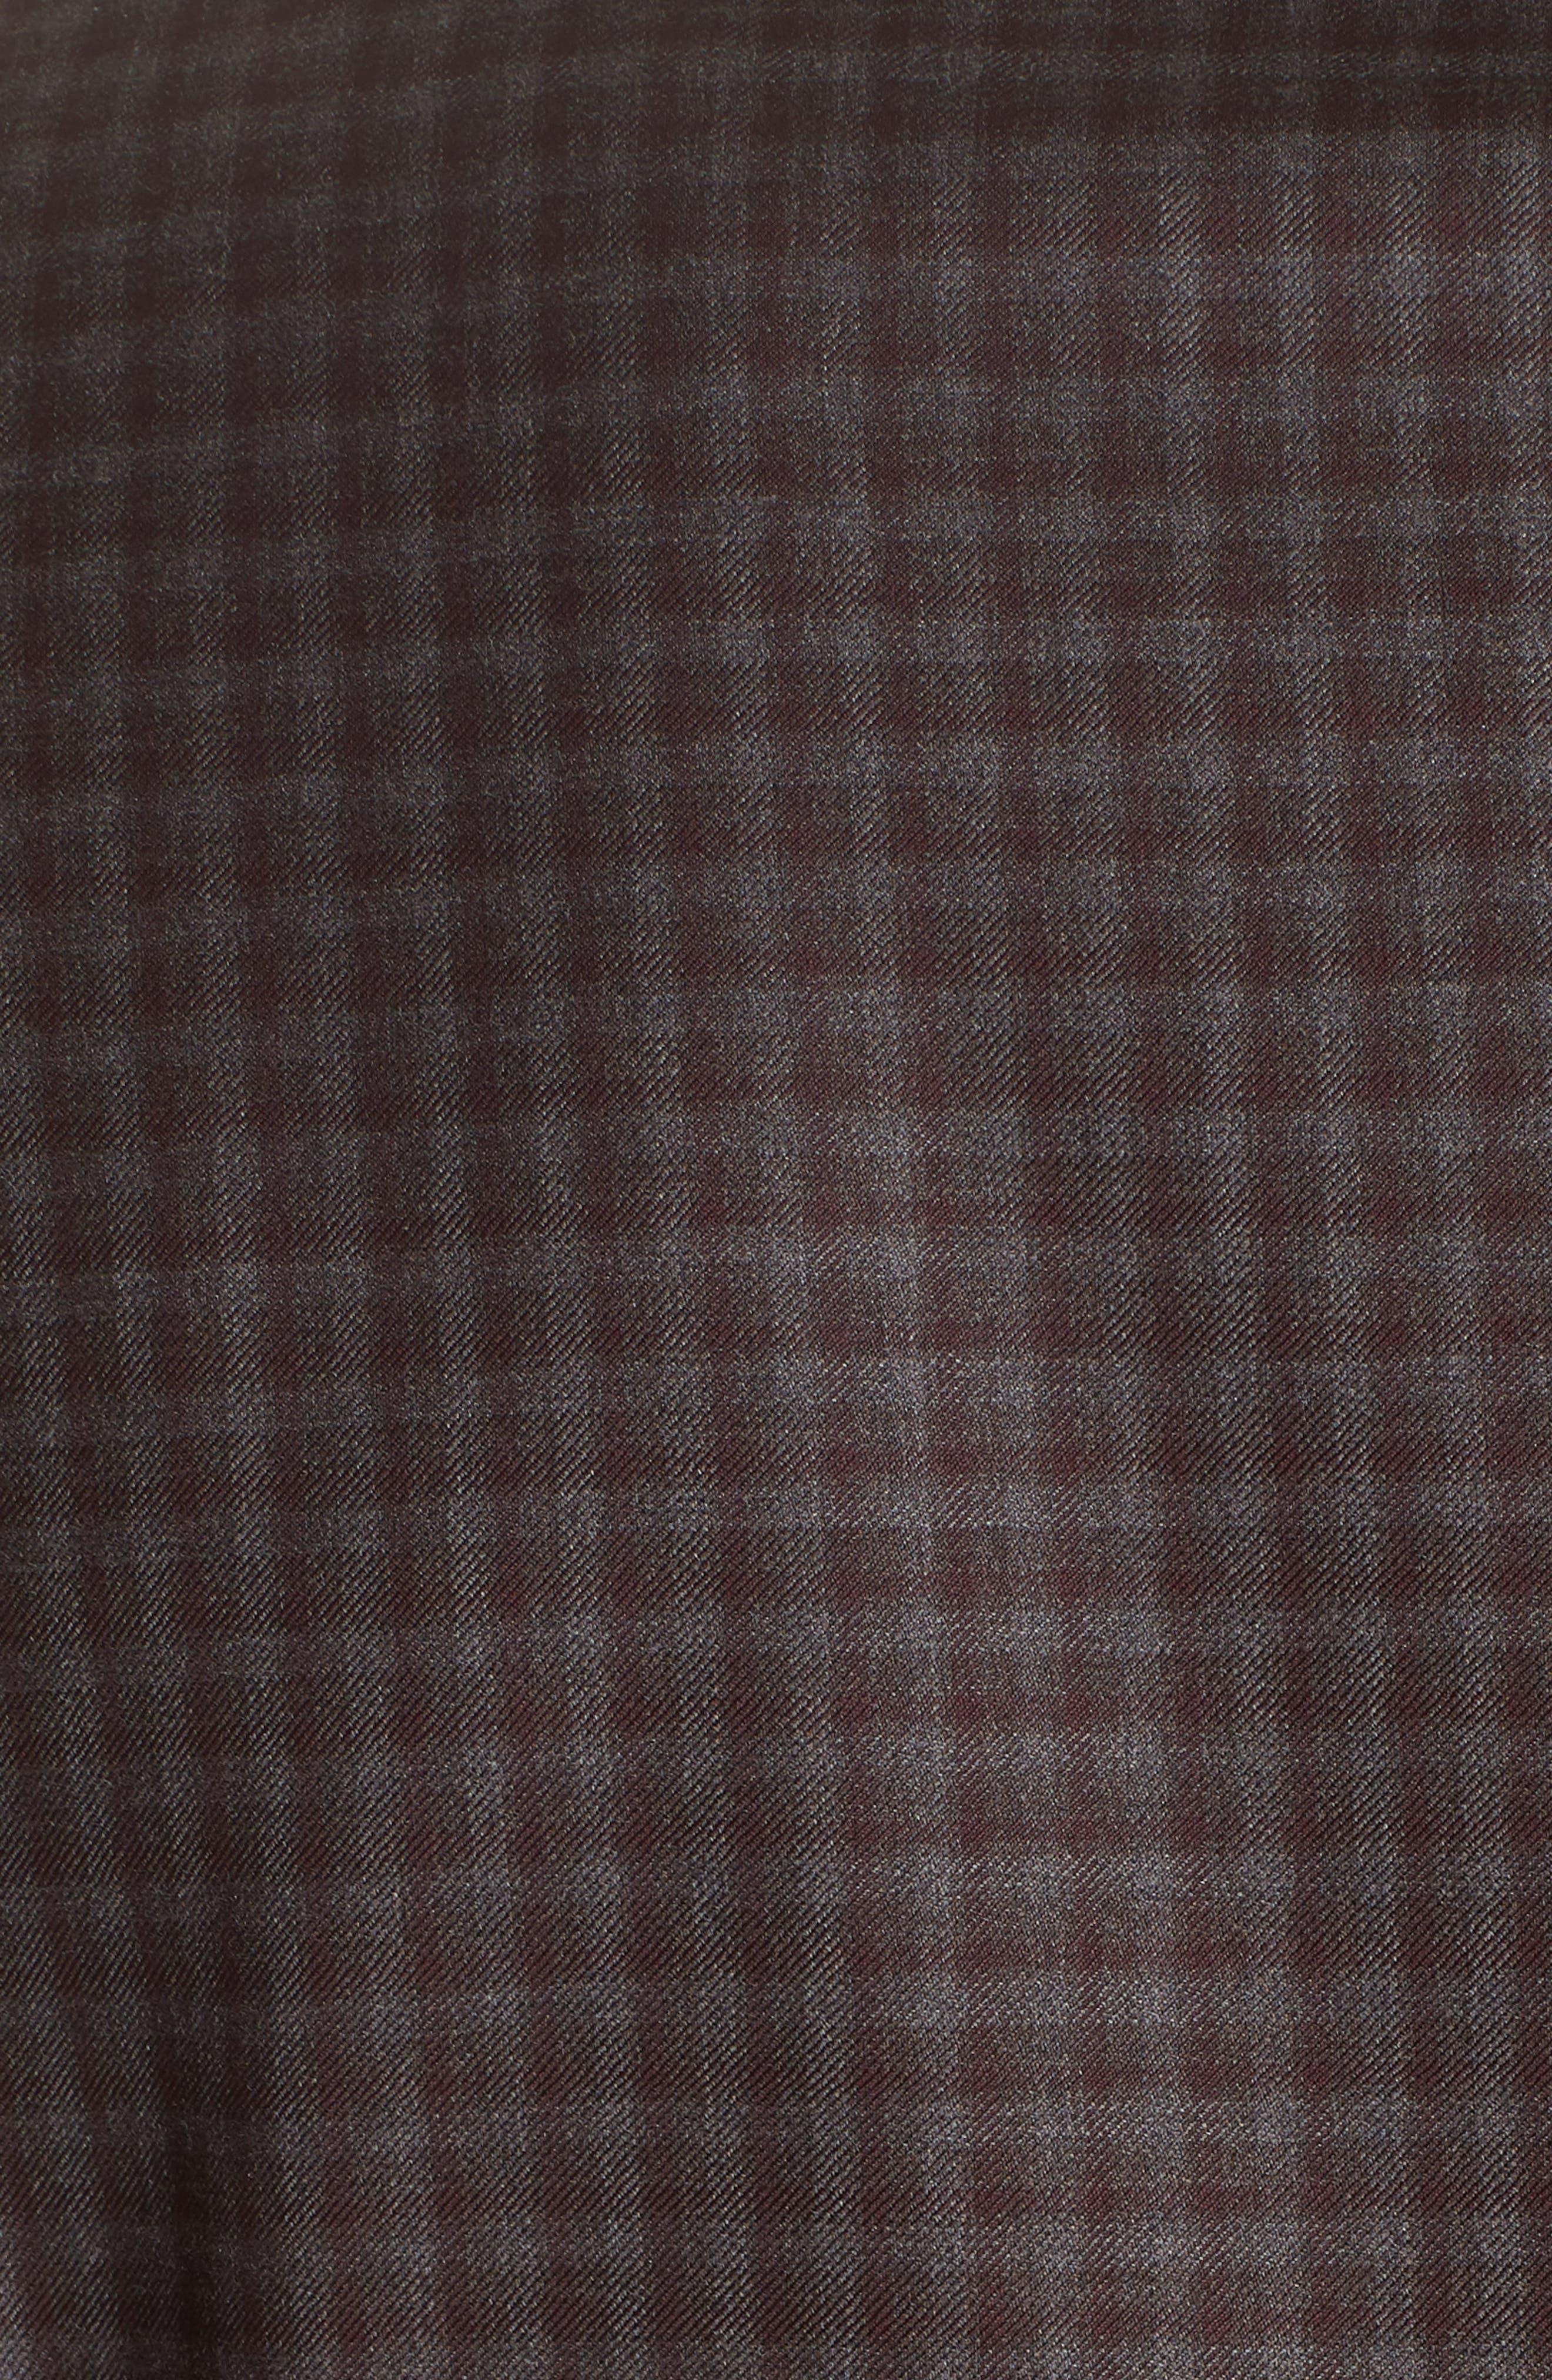 G-Line Trim Fit Plaid Wool Sport Coat,                             Alternate thumbnail 6, color,                             RED/ BROWN